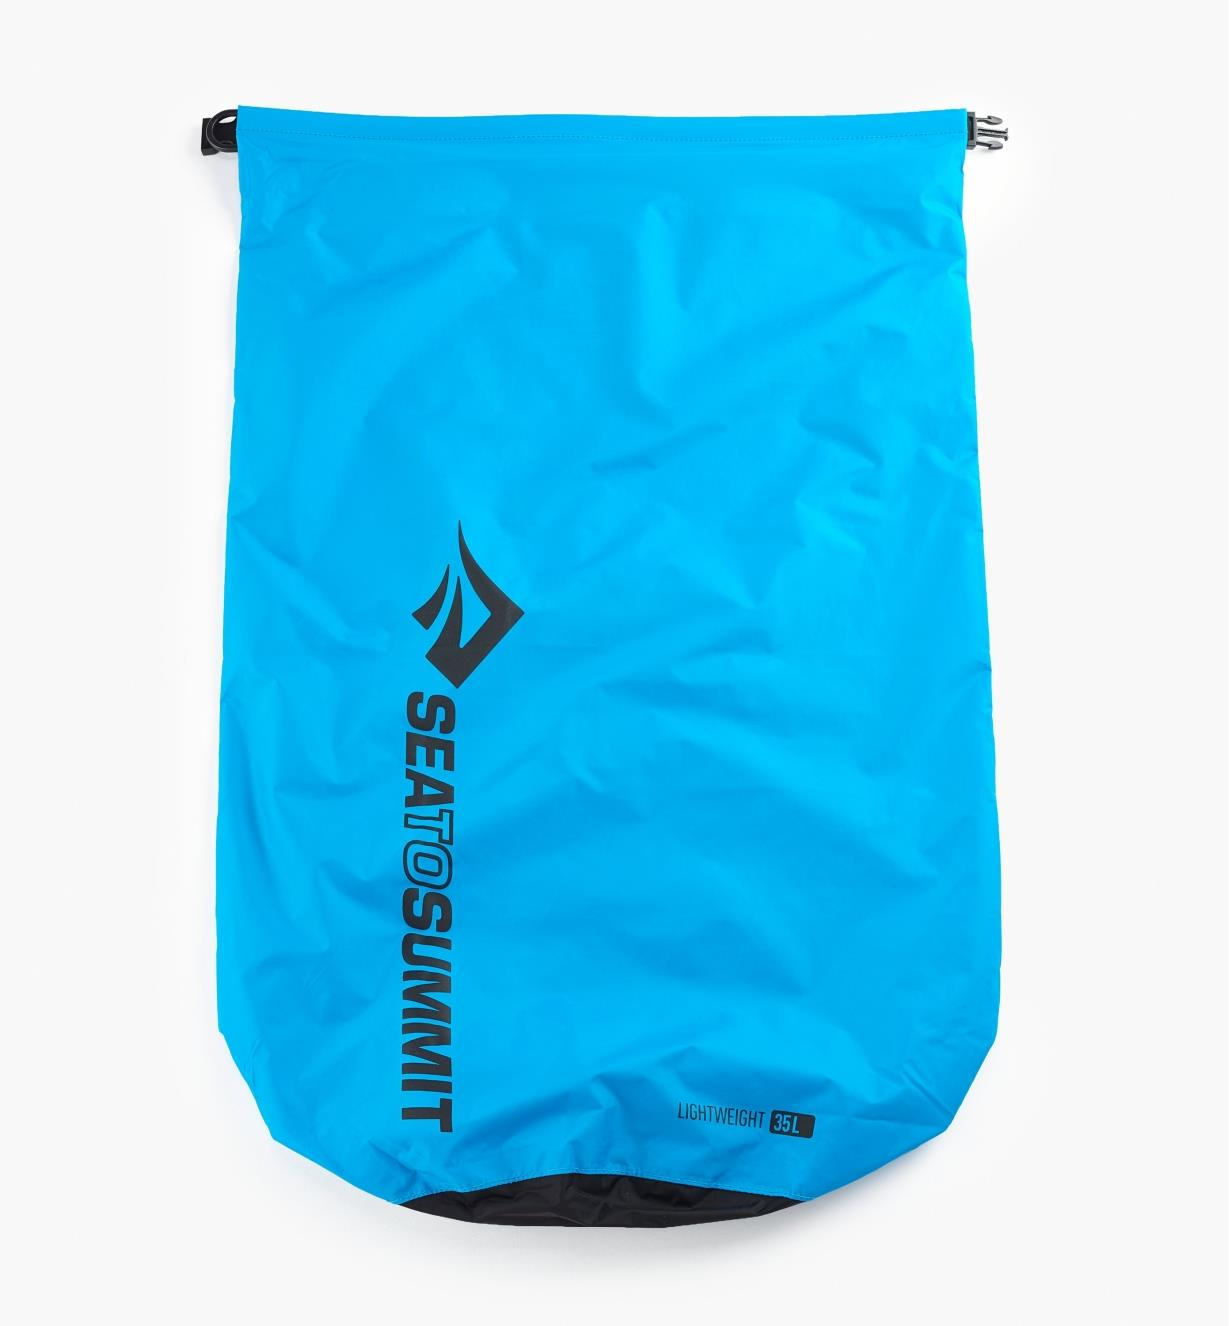 GB366 - 35 litre Dry Sack